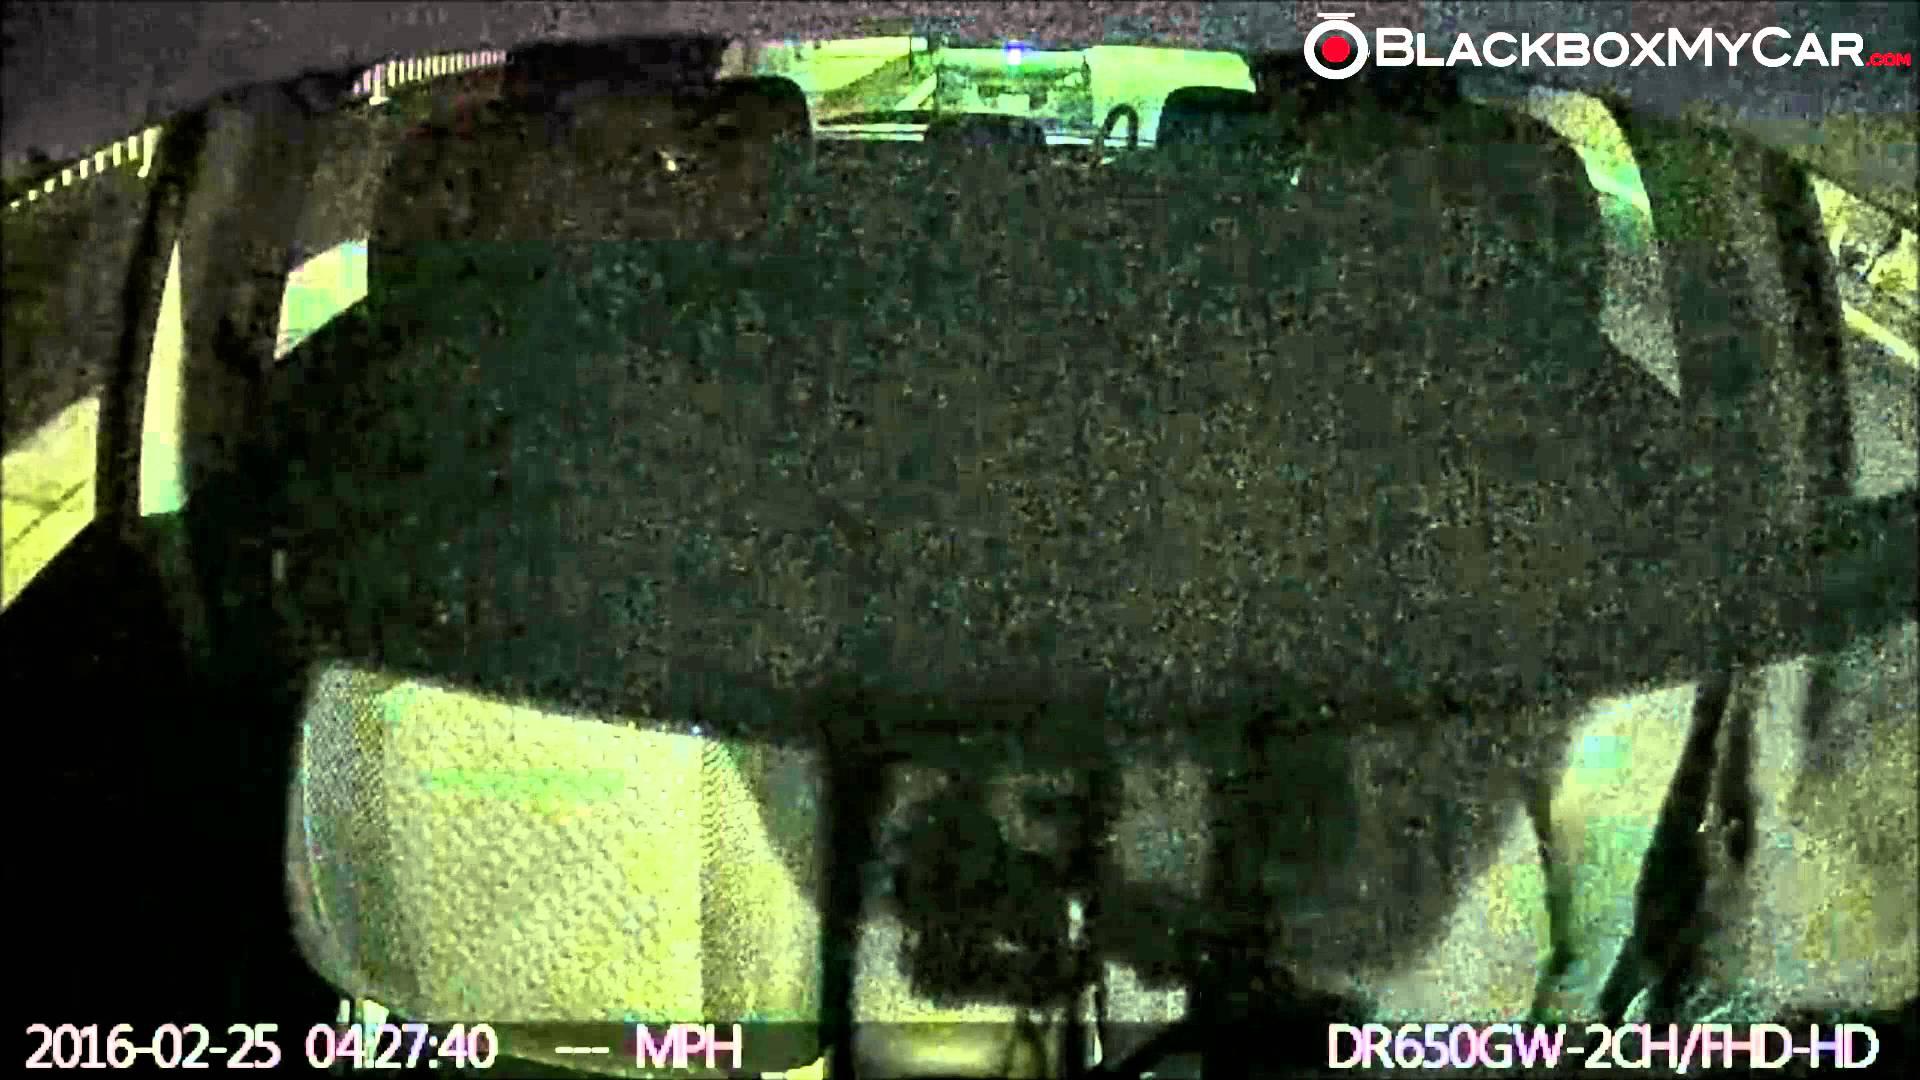 Vehicle Break-in Caught on BlackVue Dashcams